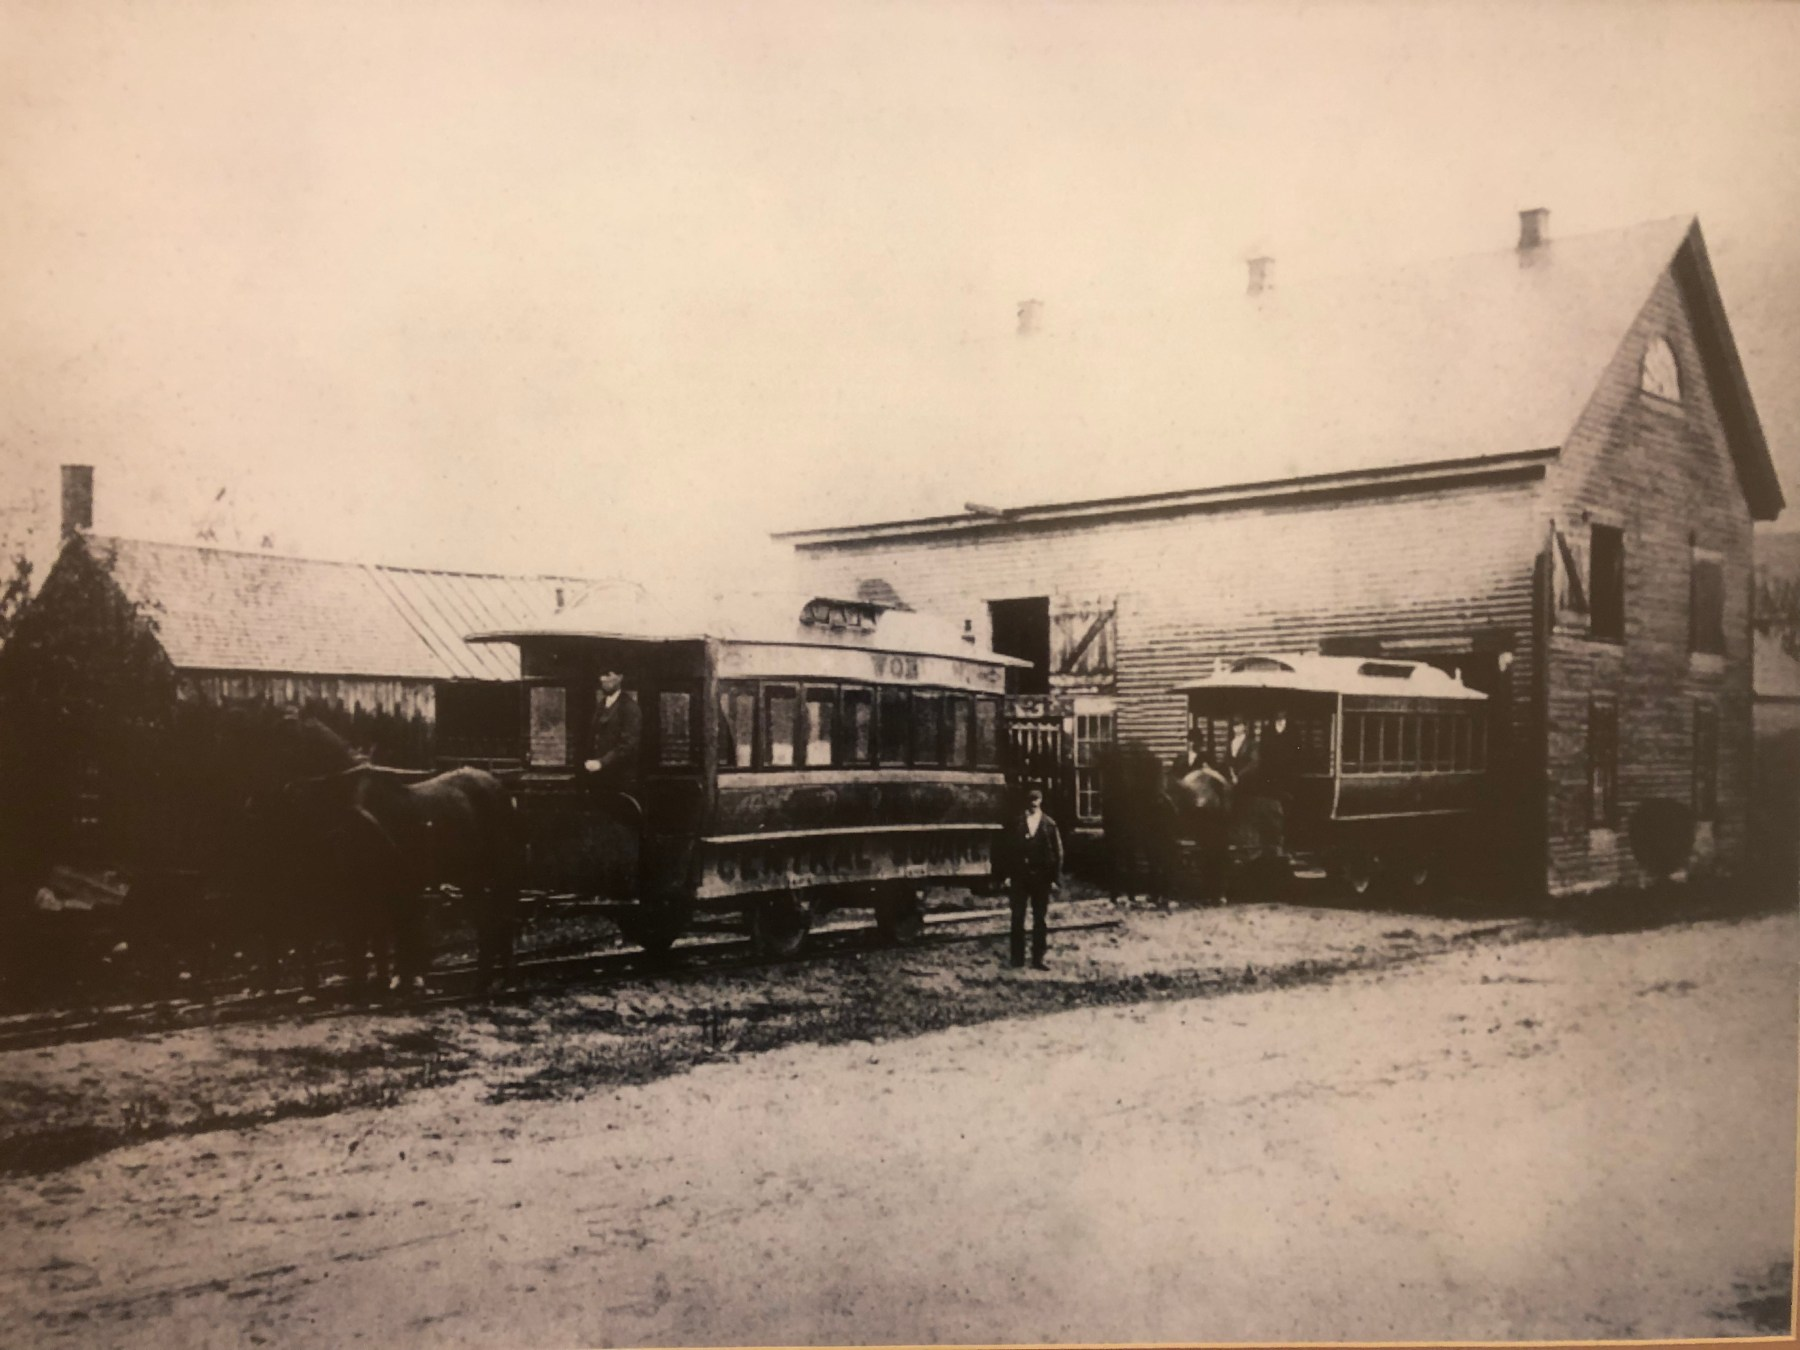 North Woburn Horse Trolley Barn, Main Street opposite Dexter Ave. 1880